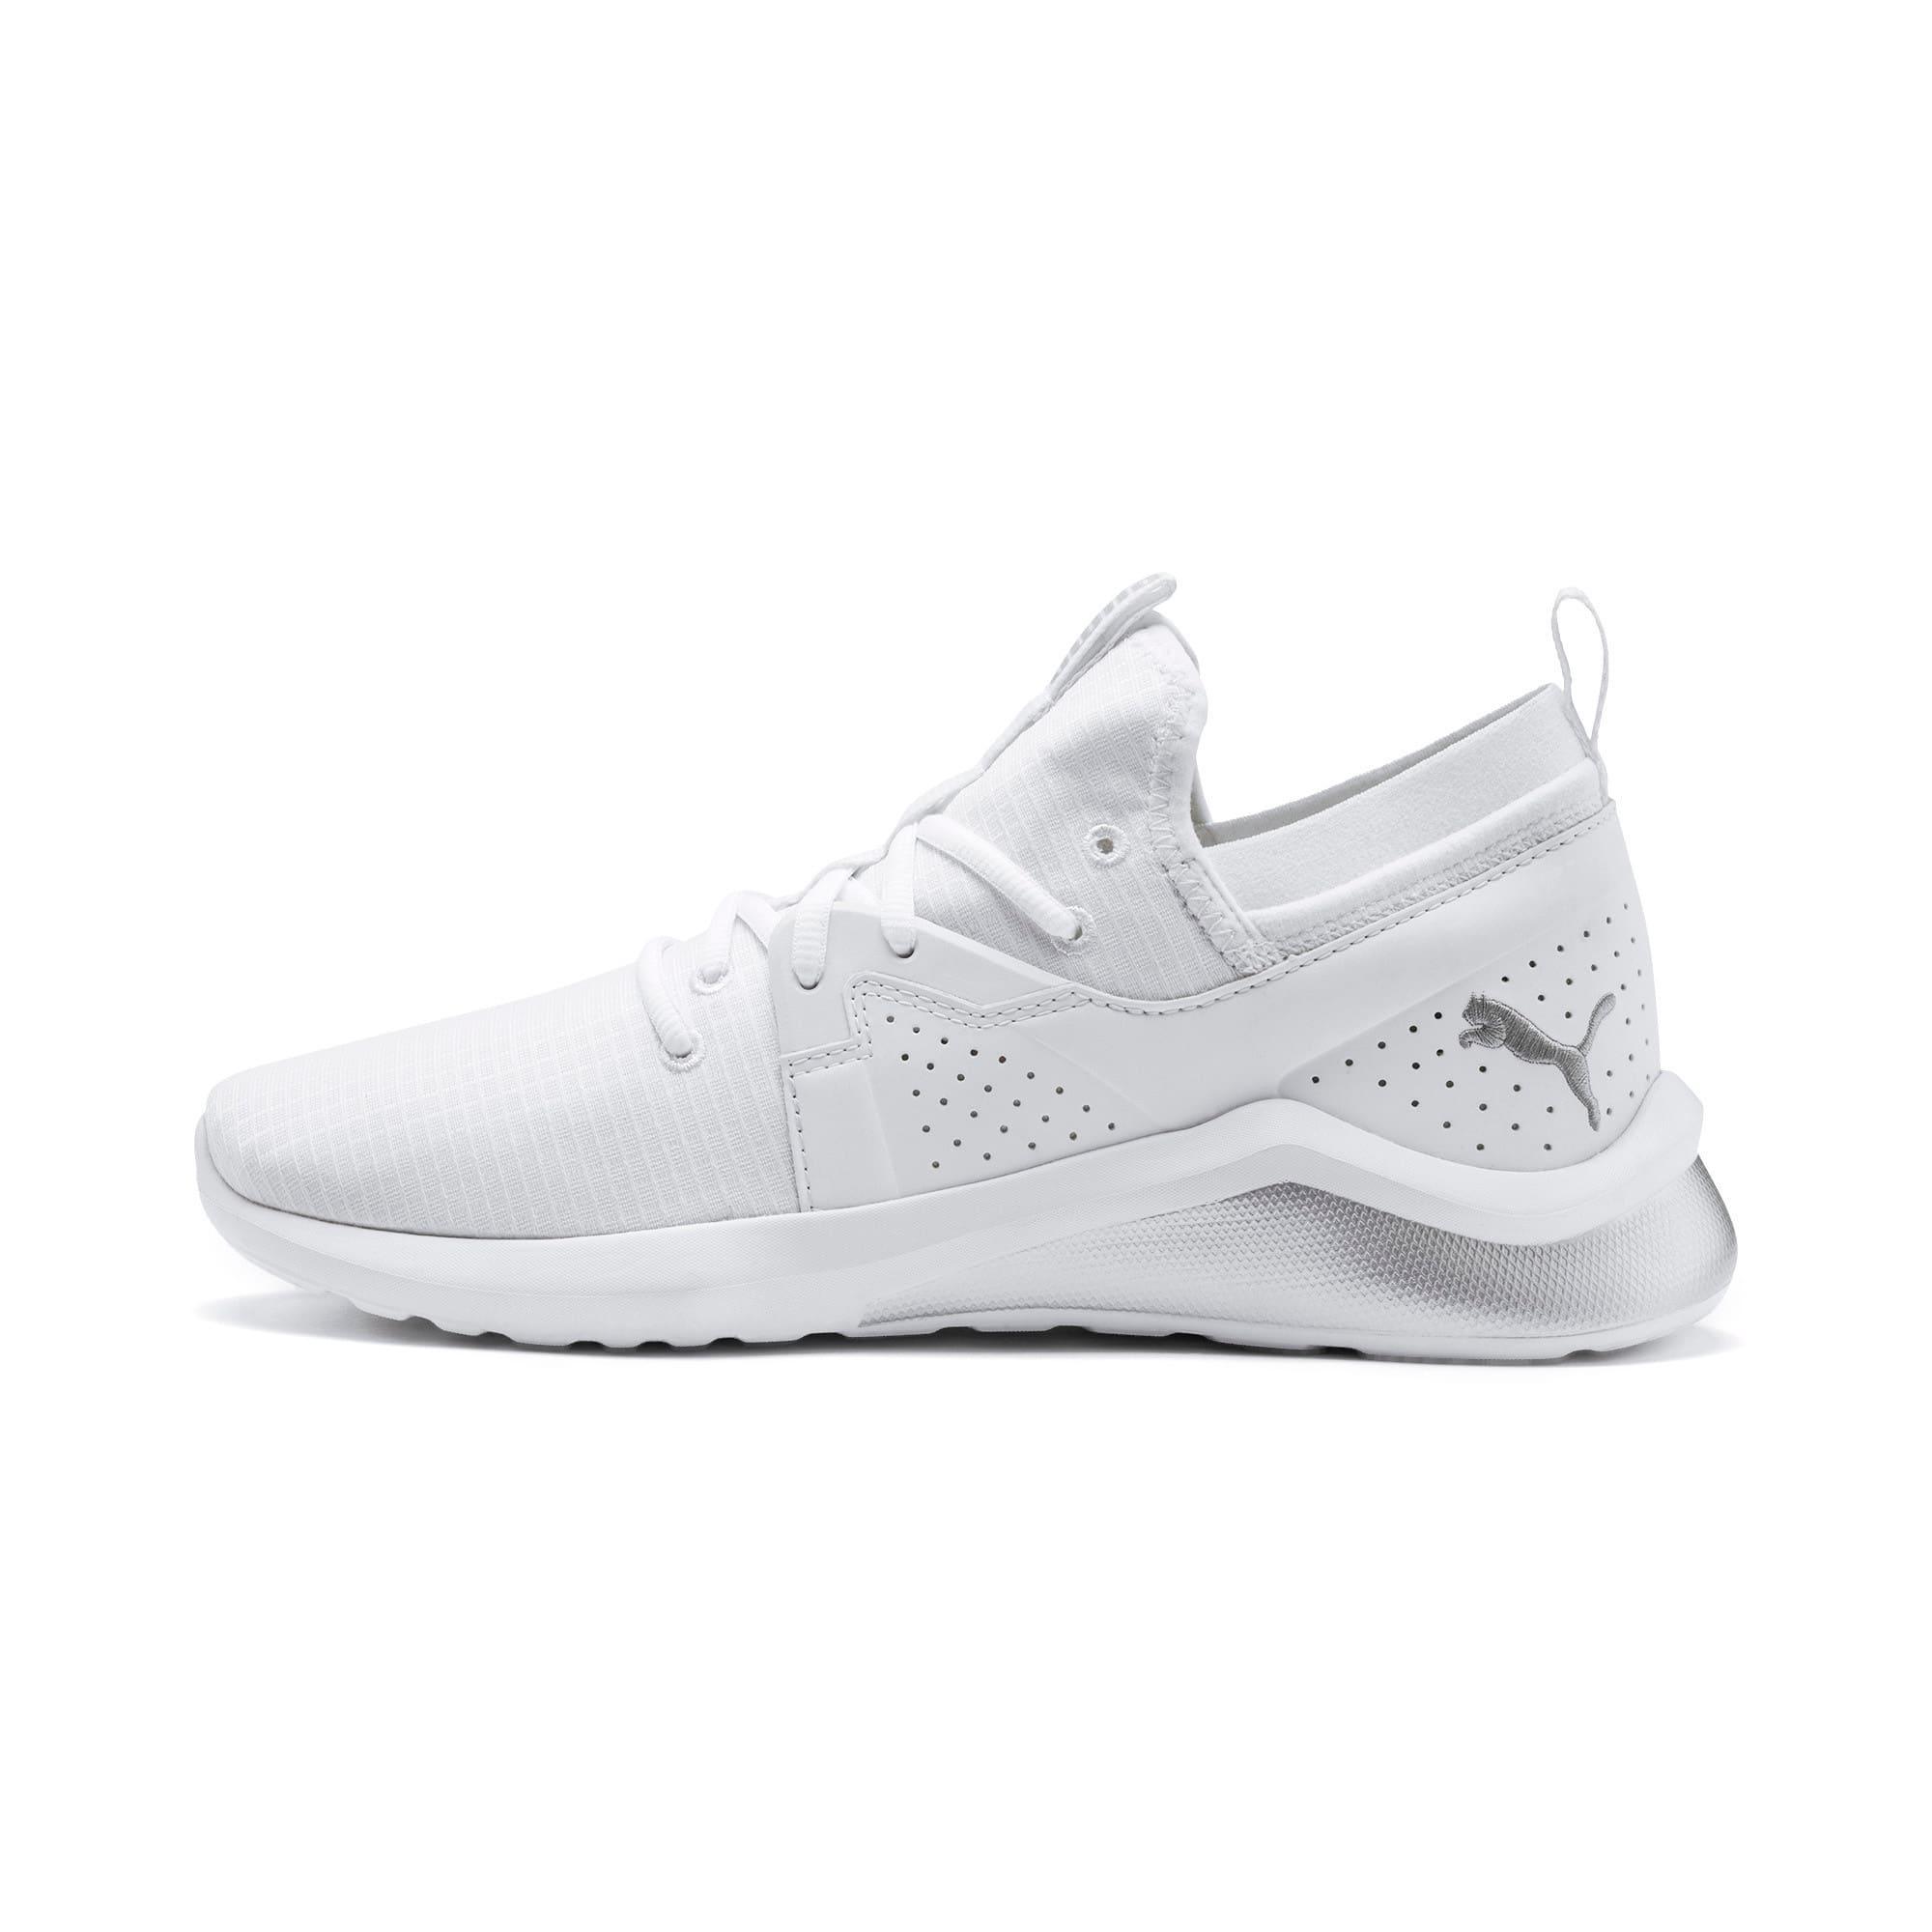 Thumbnail 1 of Emergence Lights Men's Running Shoes, Puma White-Puma Silver, medium-IND